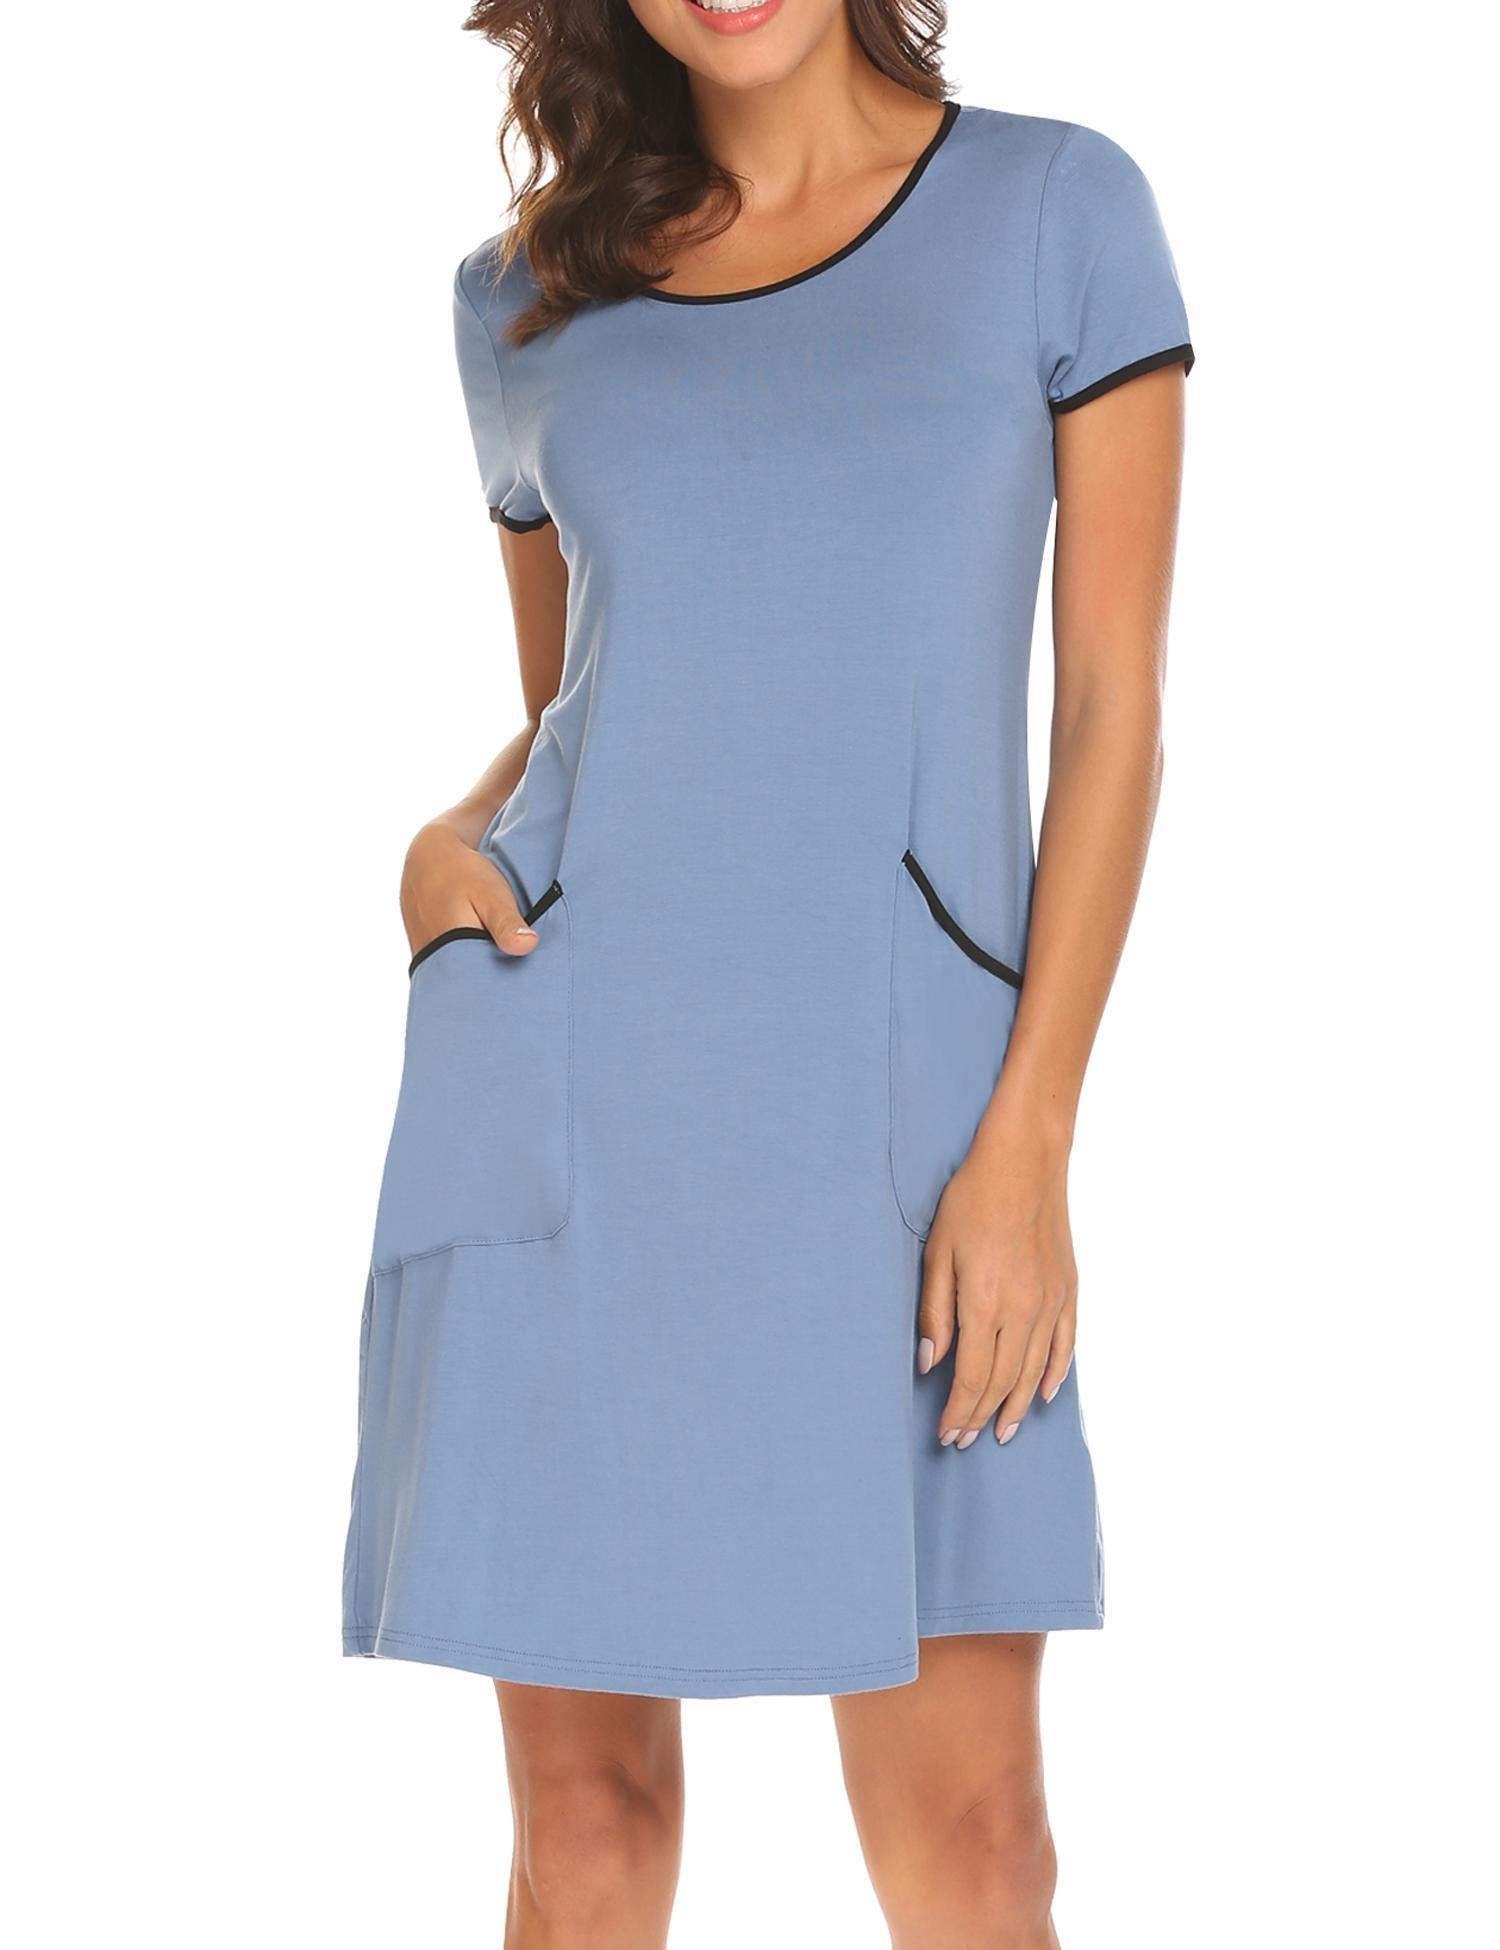 Ekouaer Women's Short Sleeve O-Neck Sleep Shirt Contrast Color T Shirt Dress with Pockets (Steel Blue M)